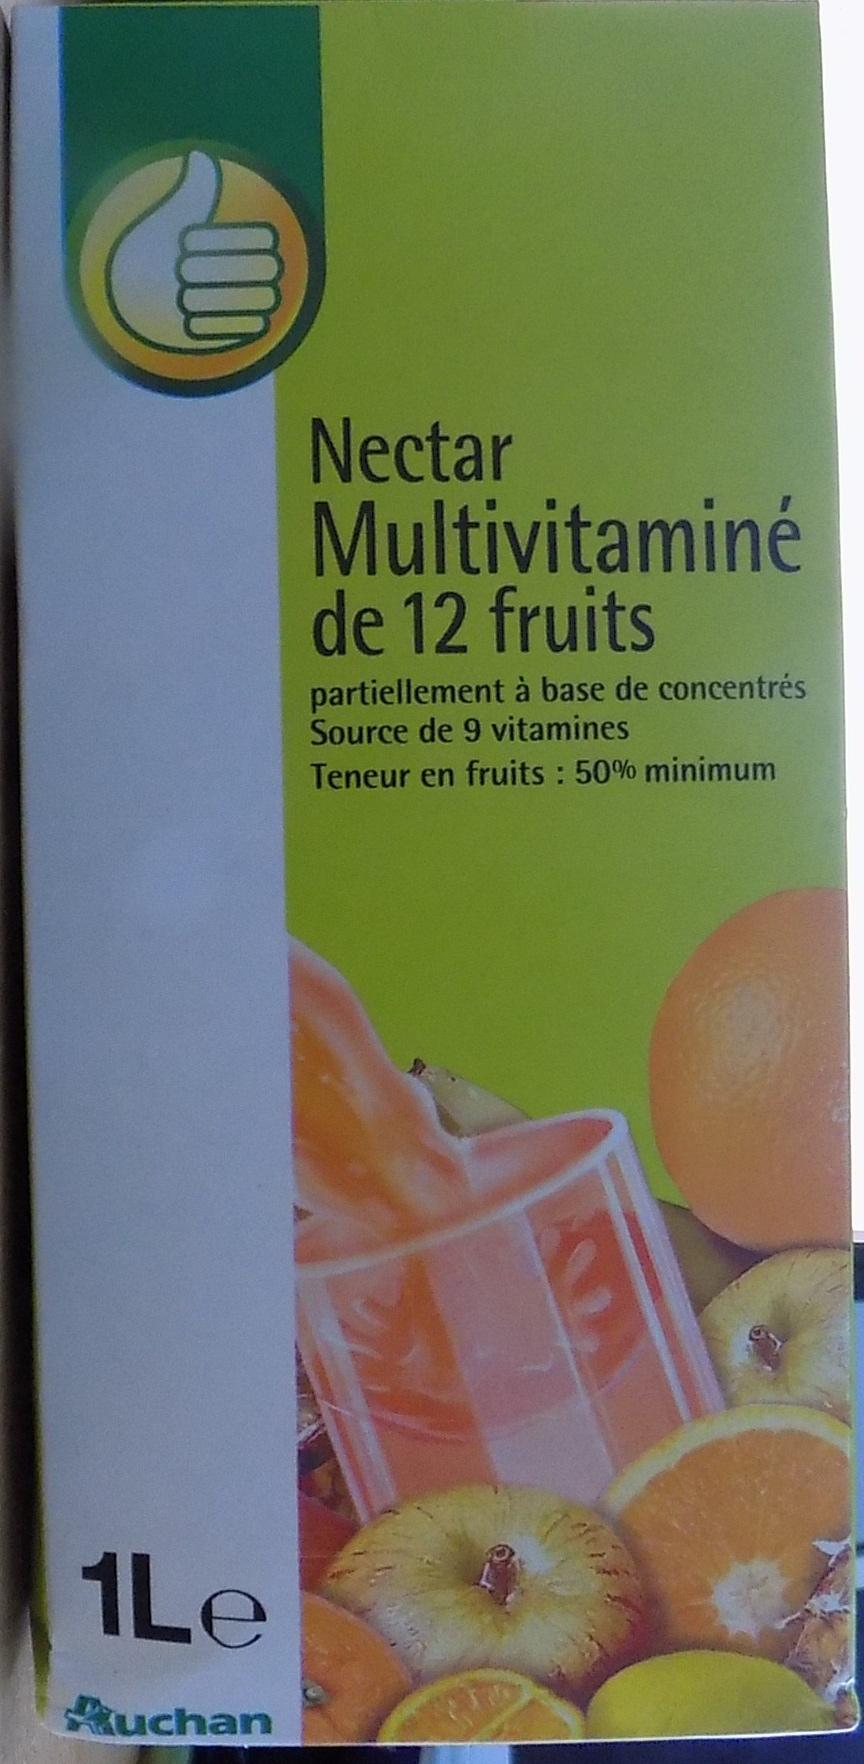 Nectar multivitaminé de 12 fruits - Product